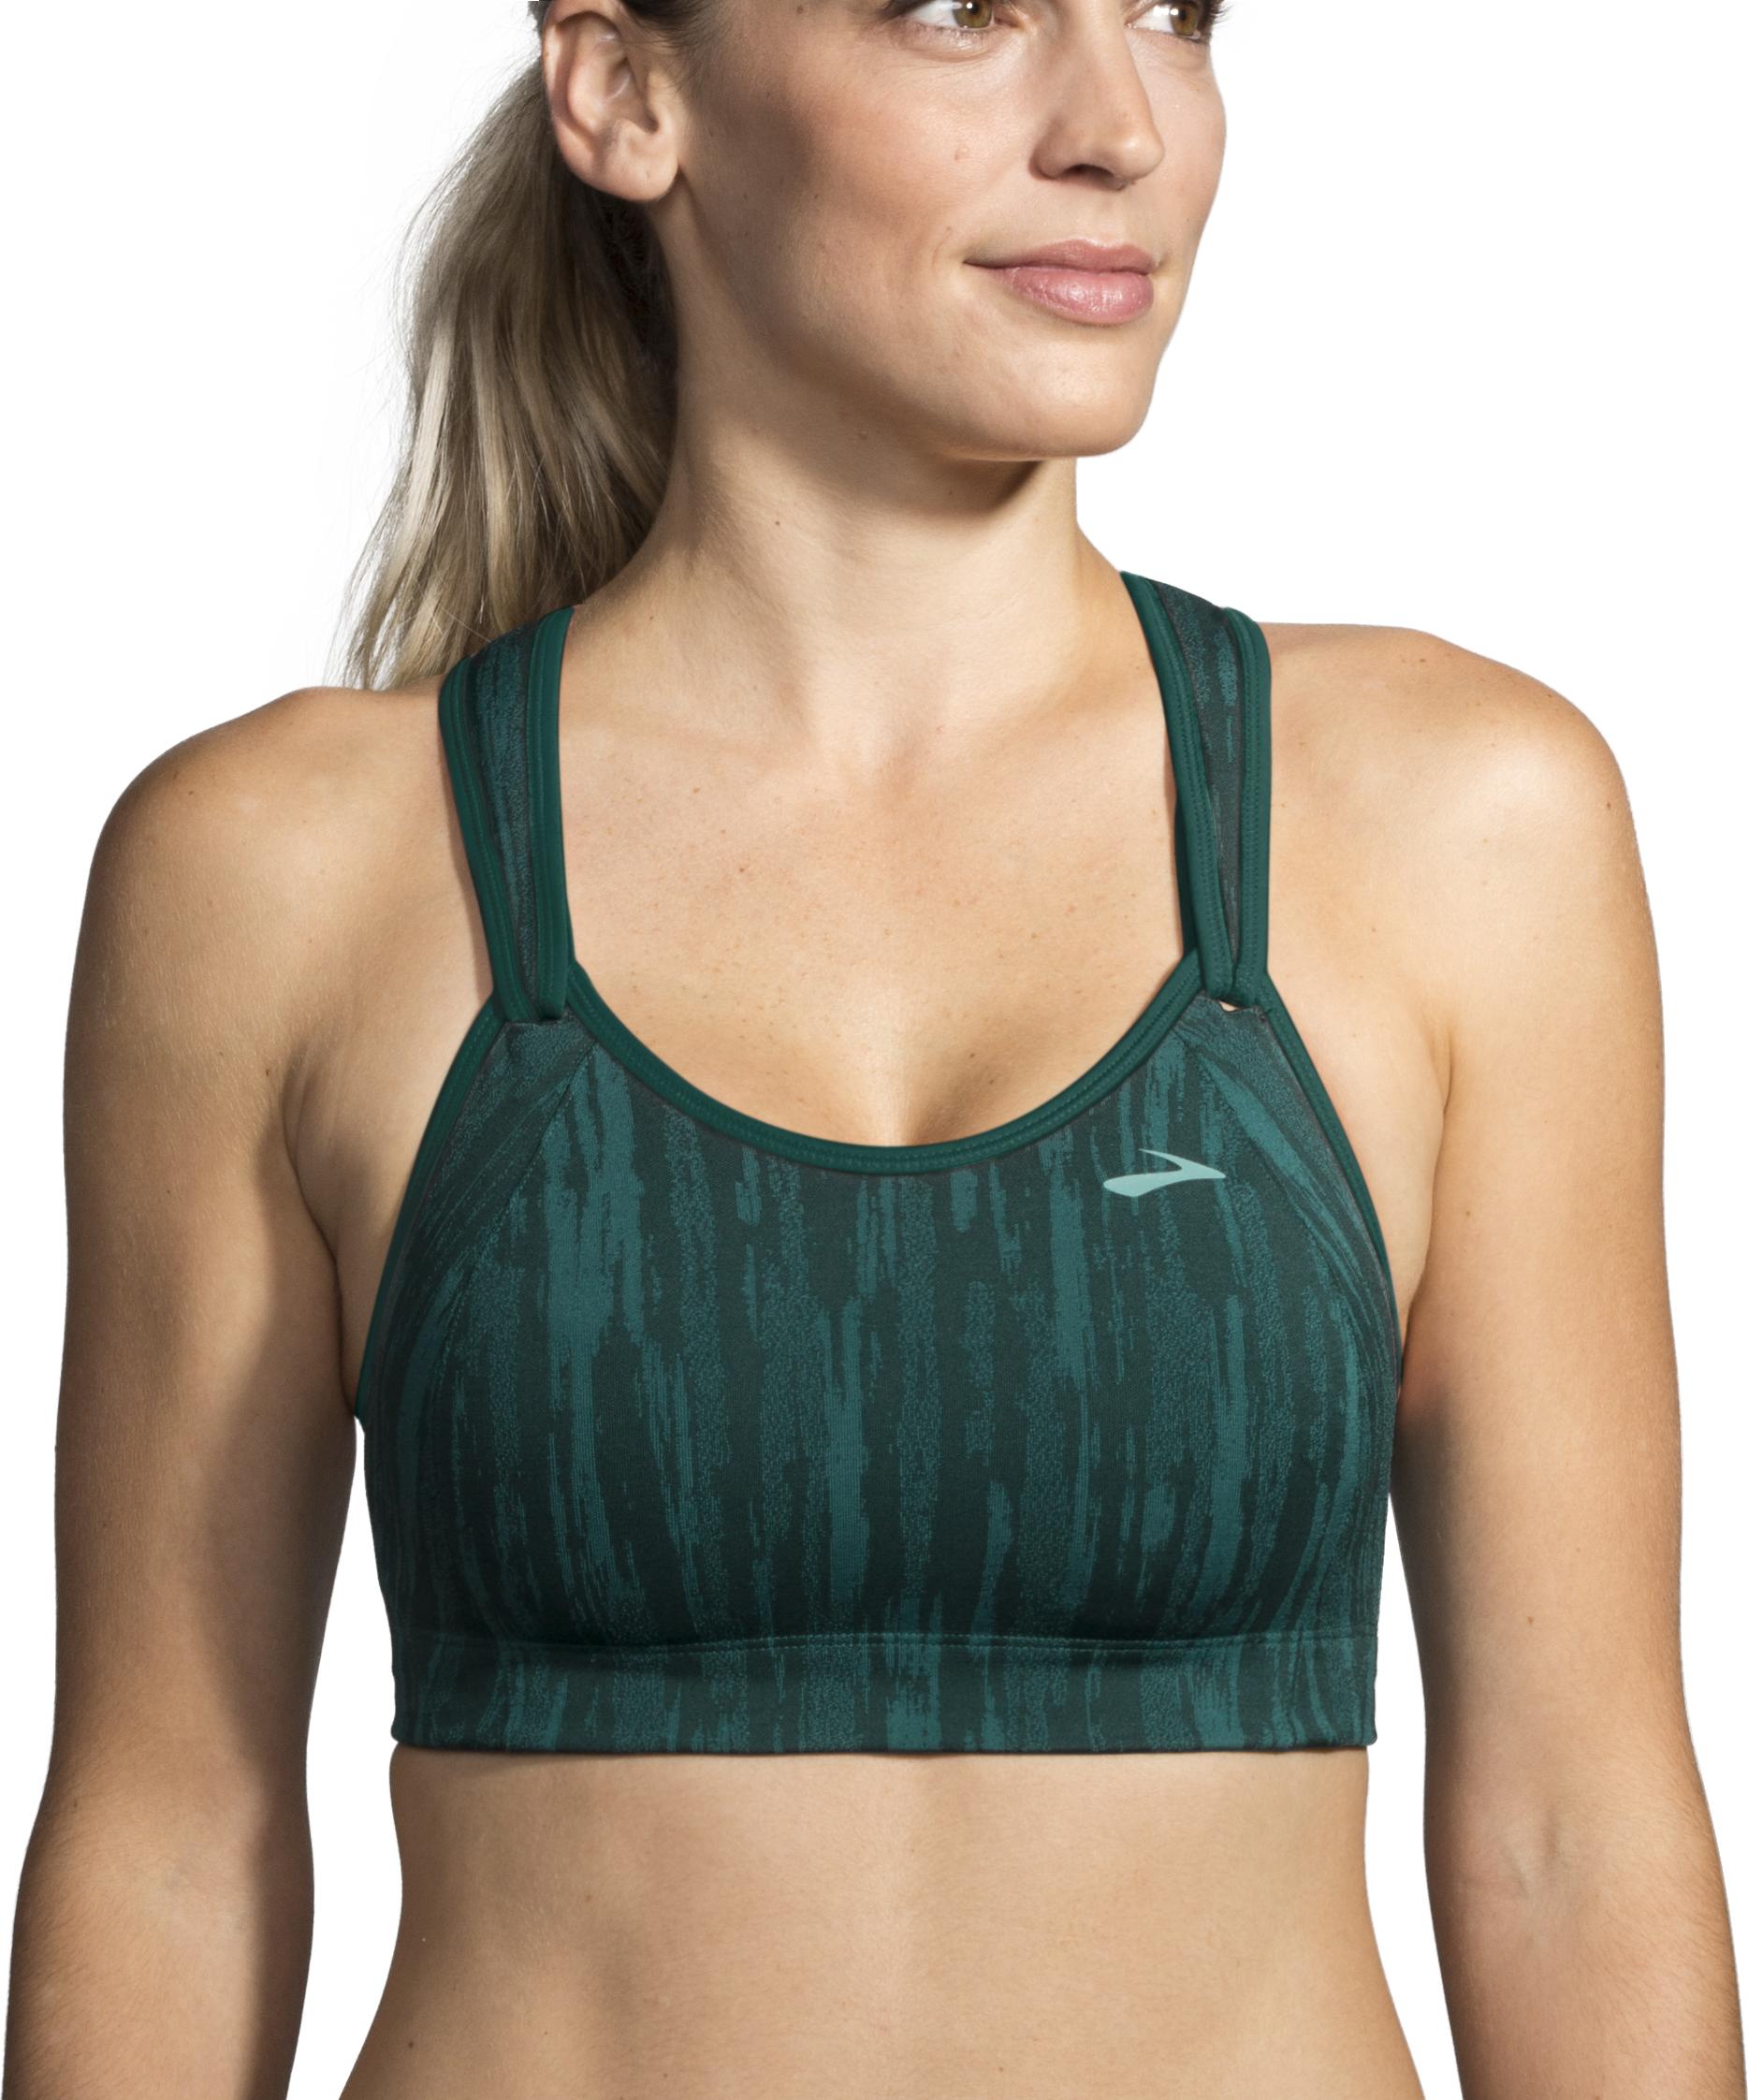 Women High Impact Shock Absorber Wireless B-G Cup Tank Top Gym Active Sports Bra